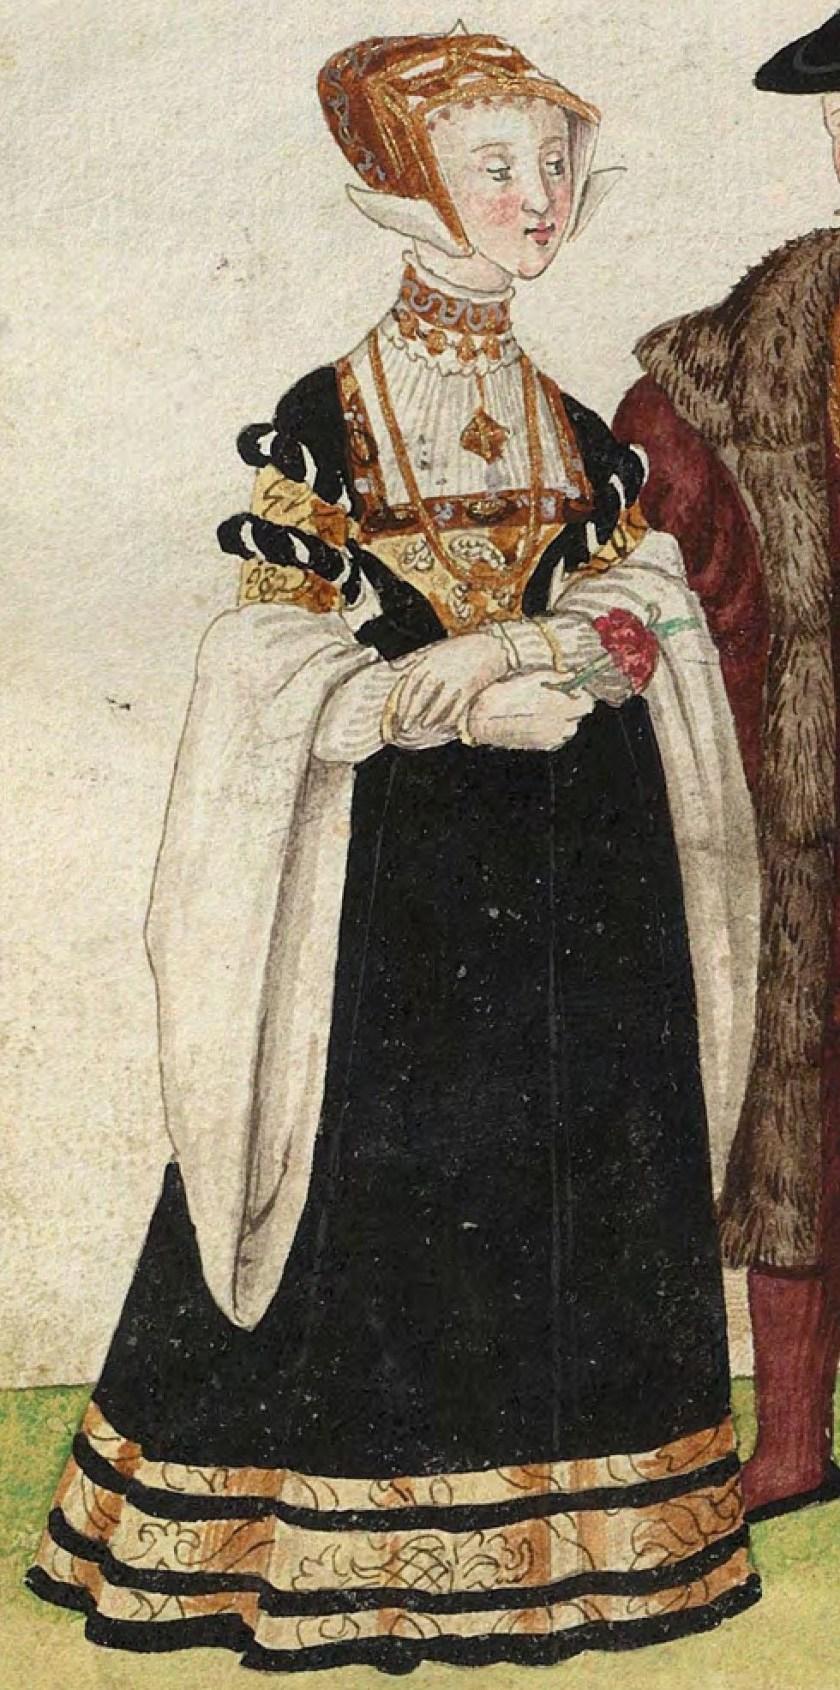 1540s Julich nobility. Fig. 1, plate 42v, Codice de trajes, Christoph Weiditz. BNE bdh0000052132